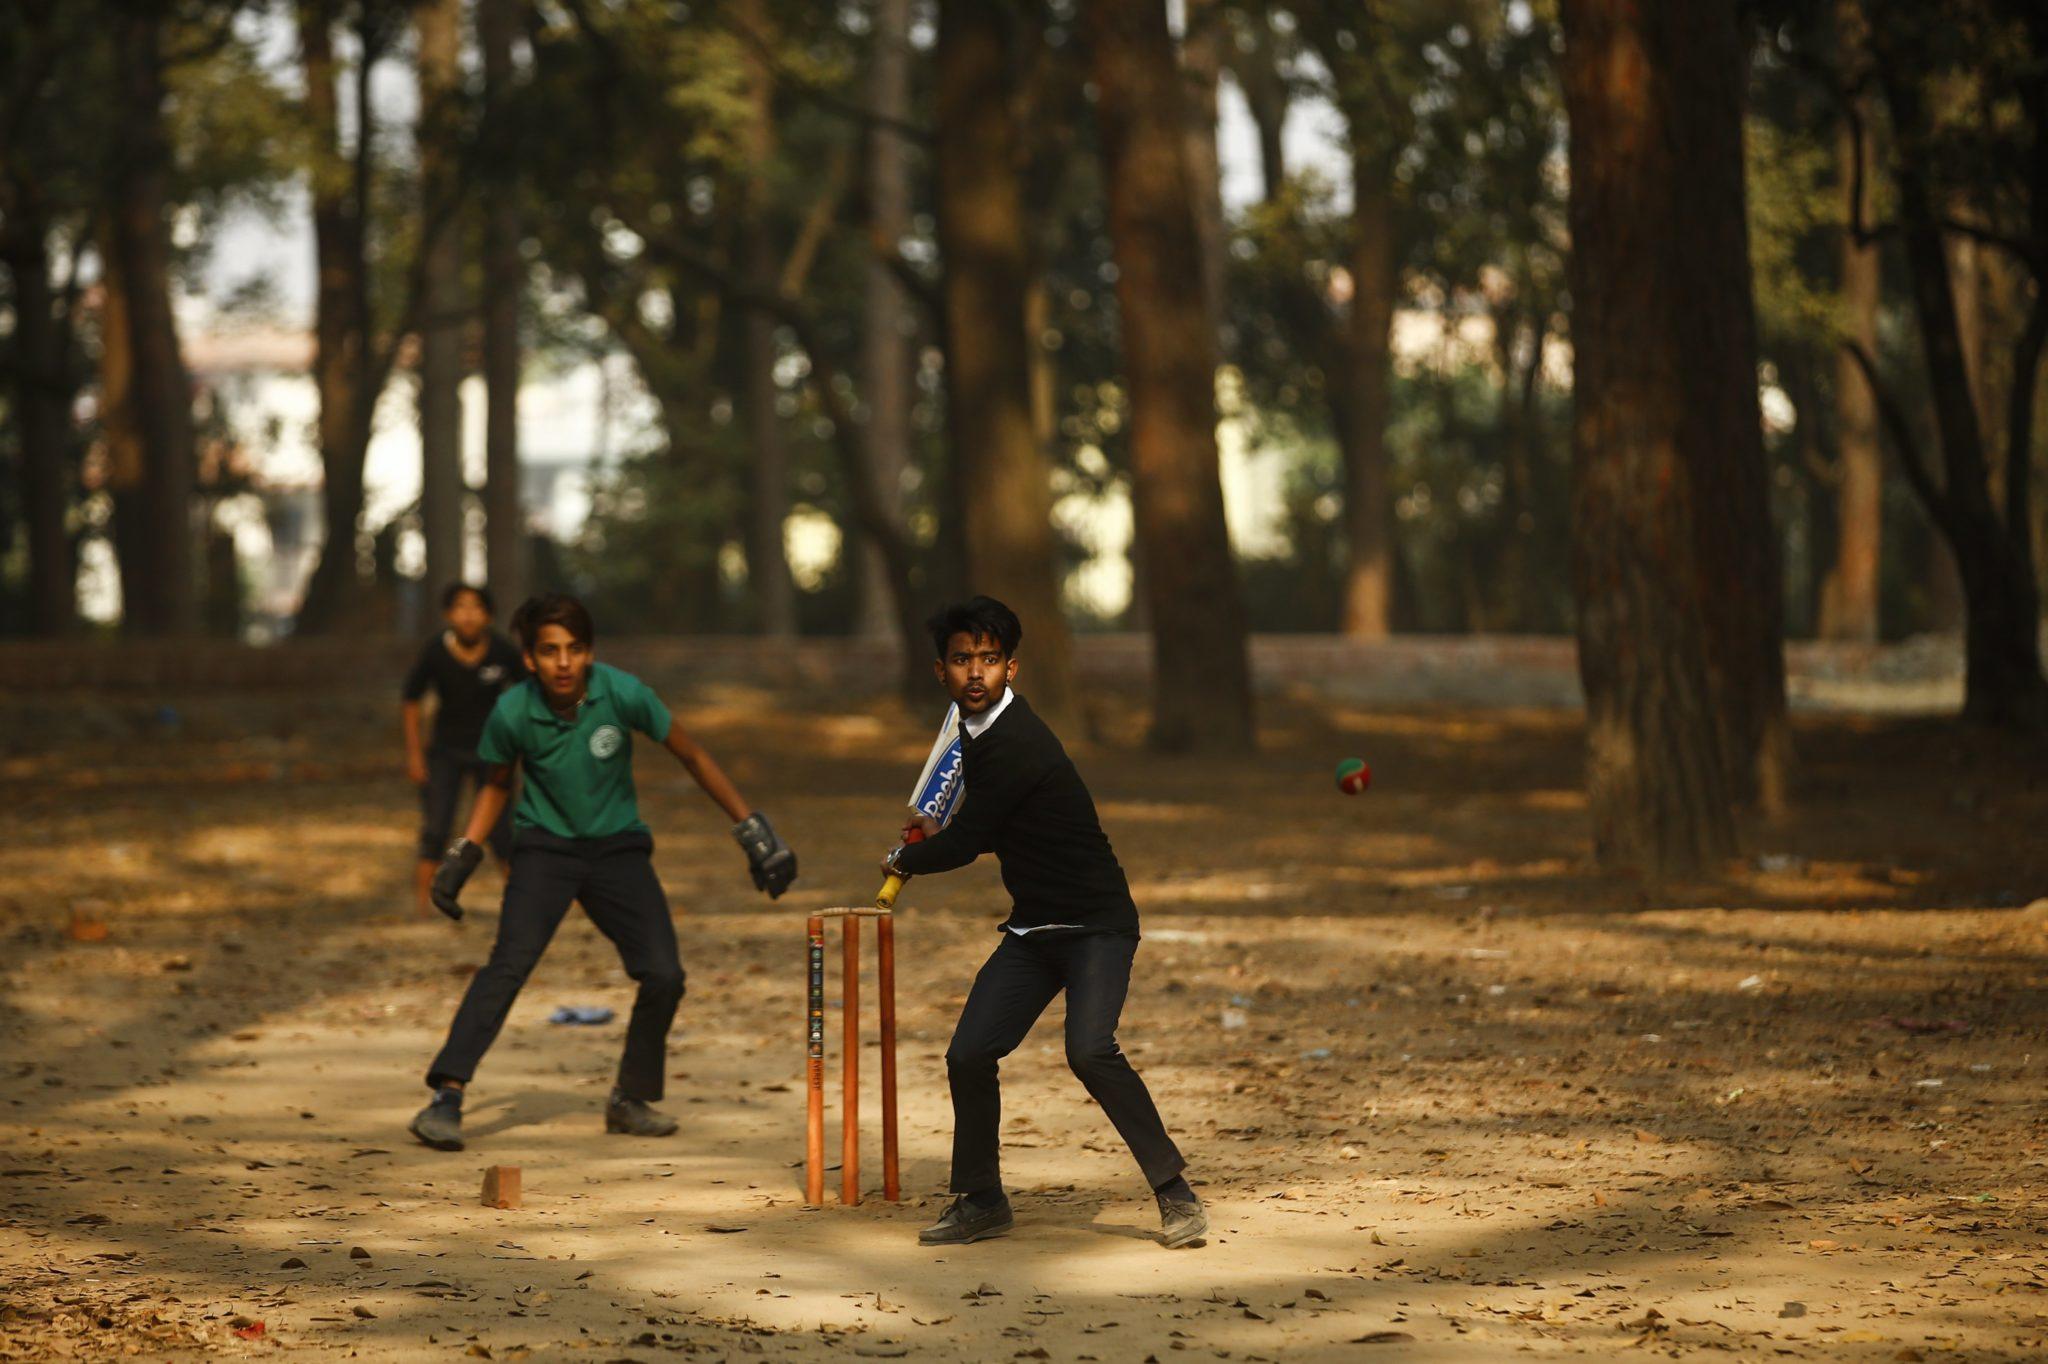 Nepal: dzieci grające w krykieta w Katmandu (foto. PAP/EPA/NARENDRA SHRESTHA)